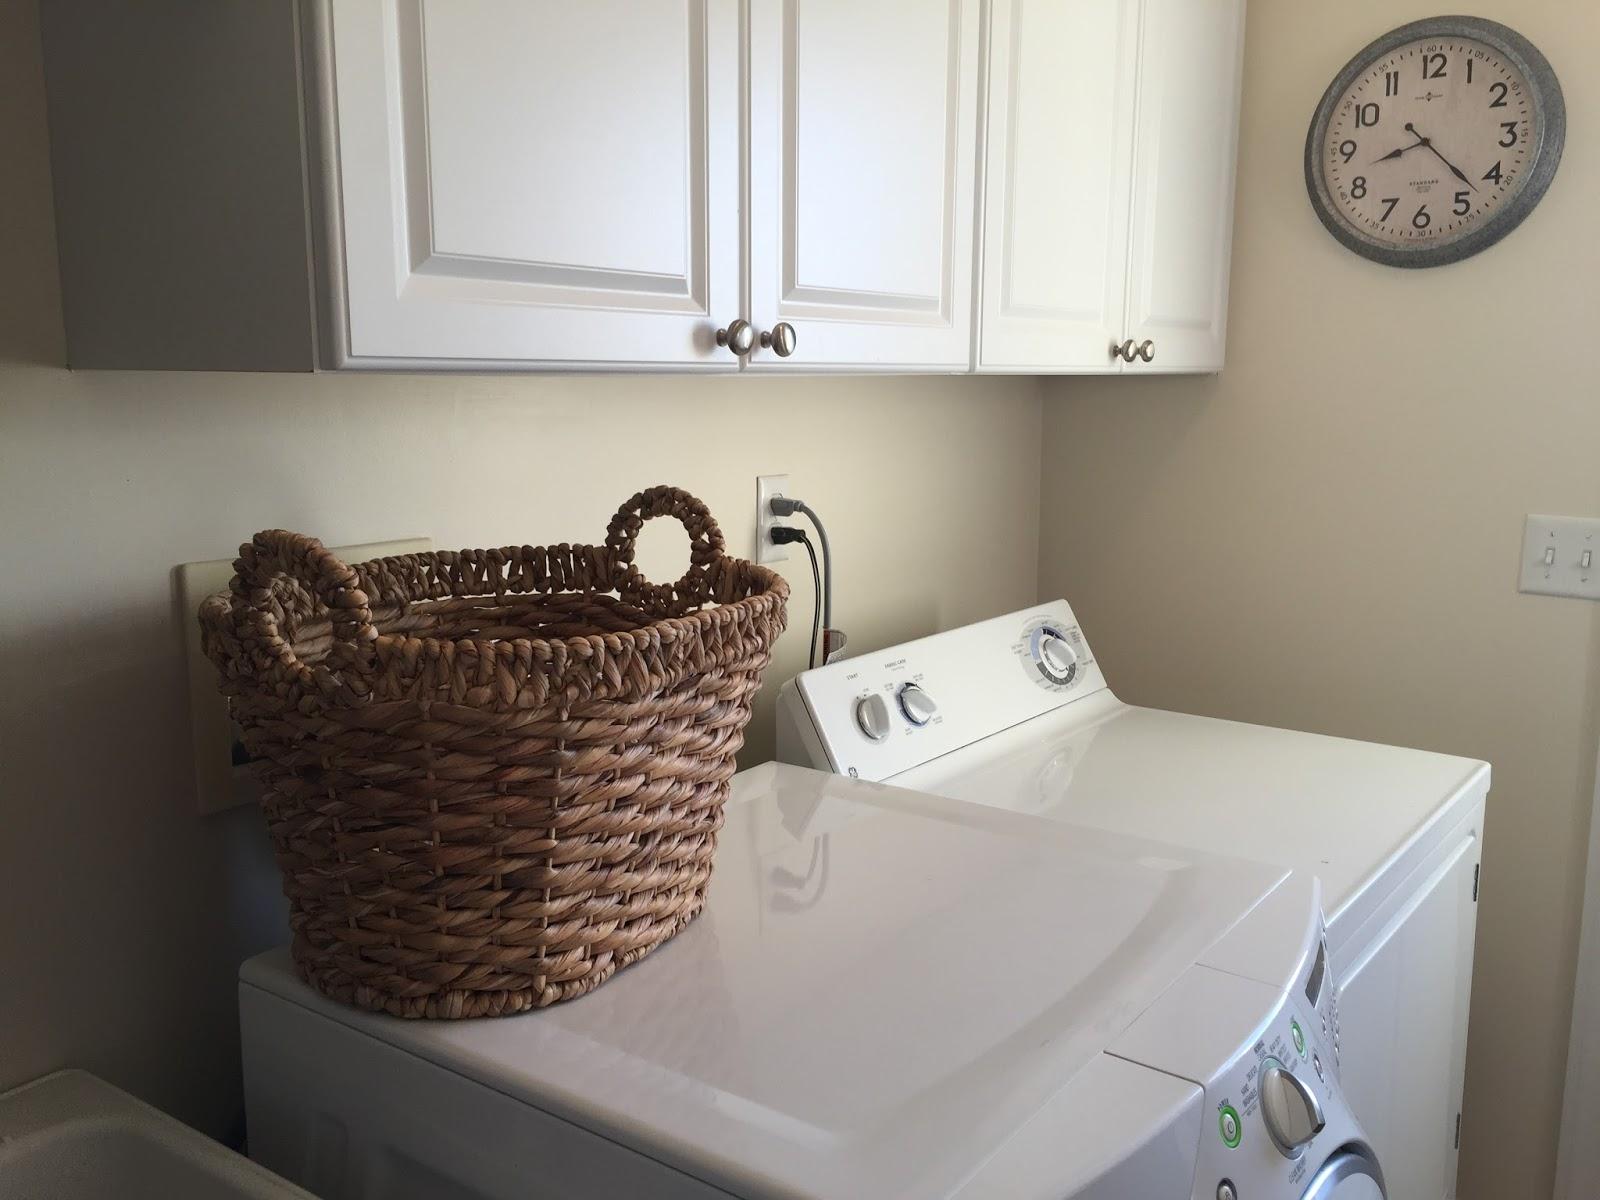 Sock Basket in Laundry Room